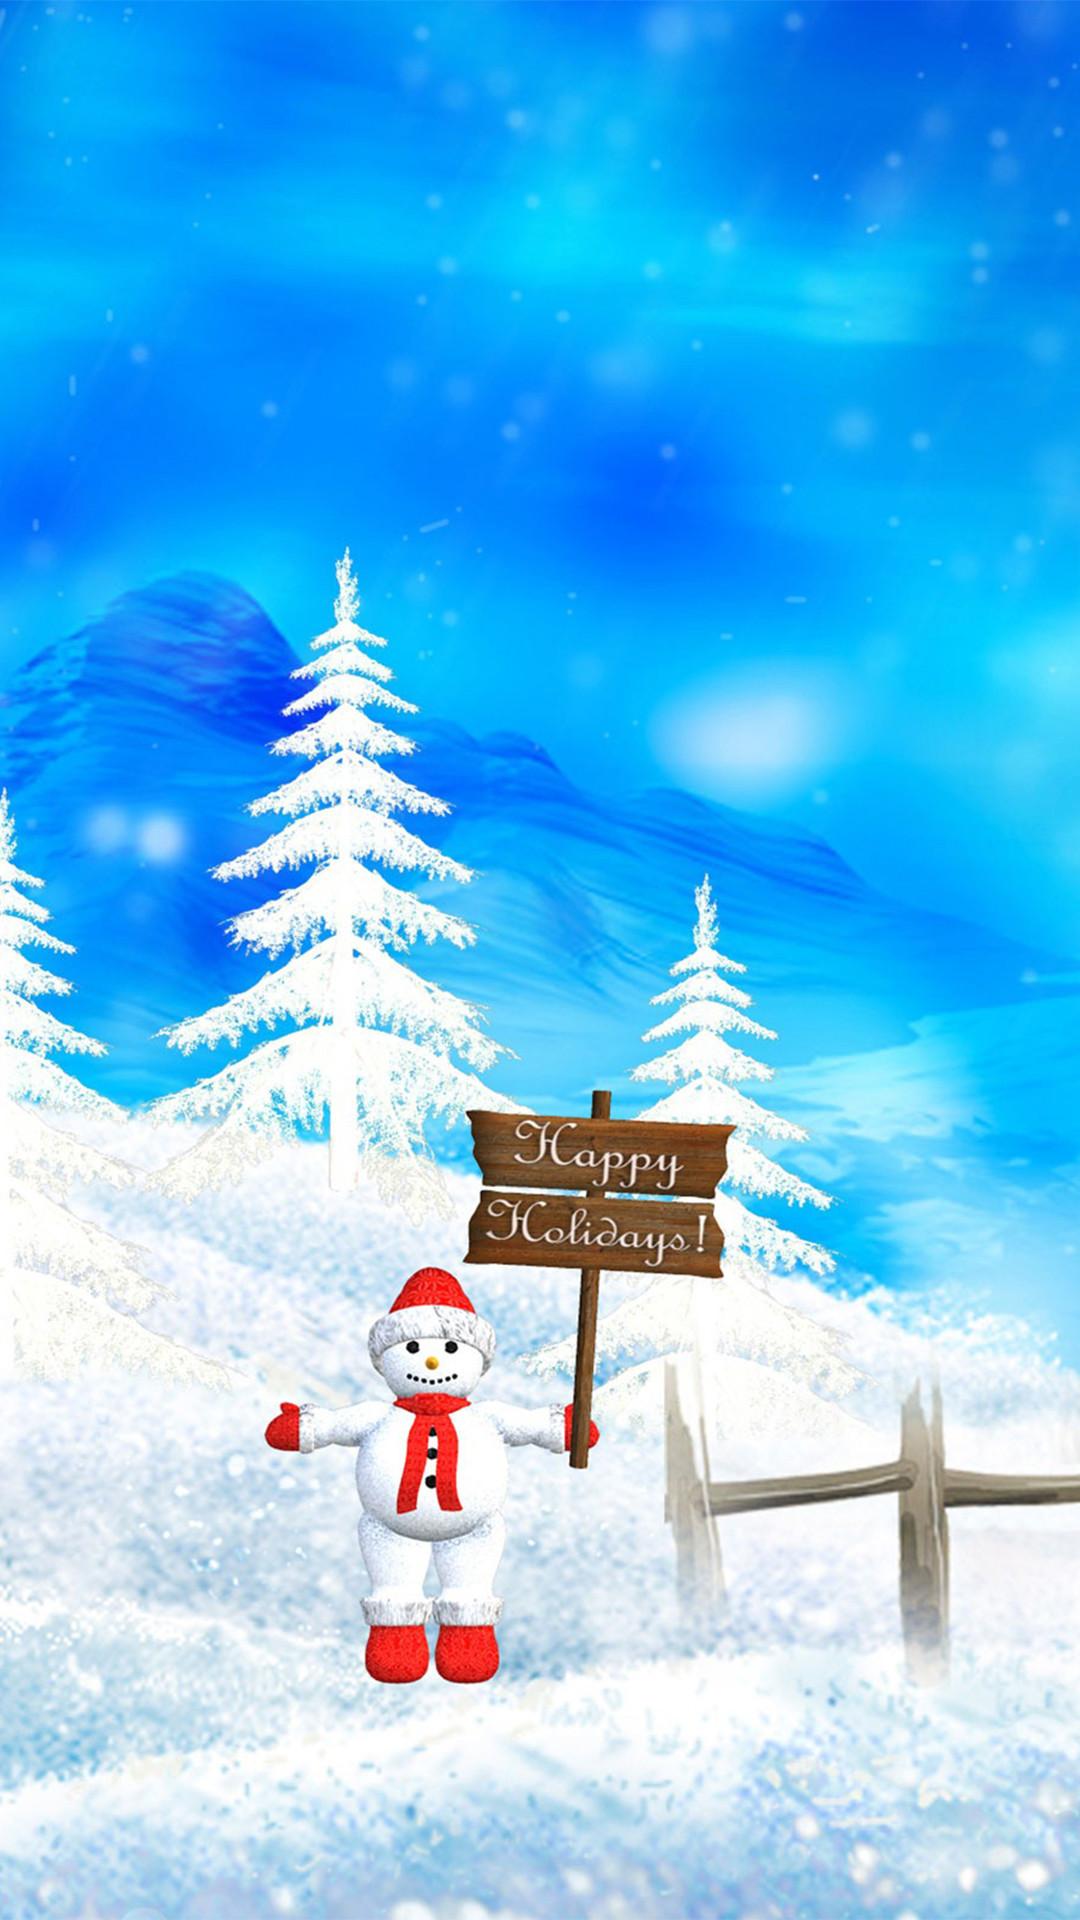 Snowman-Christmas-Wallpaper-iphone-6-Plus-by-Blackberyy-